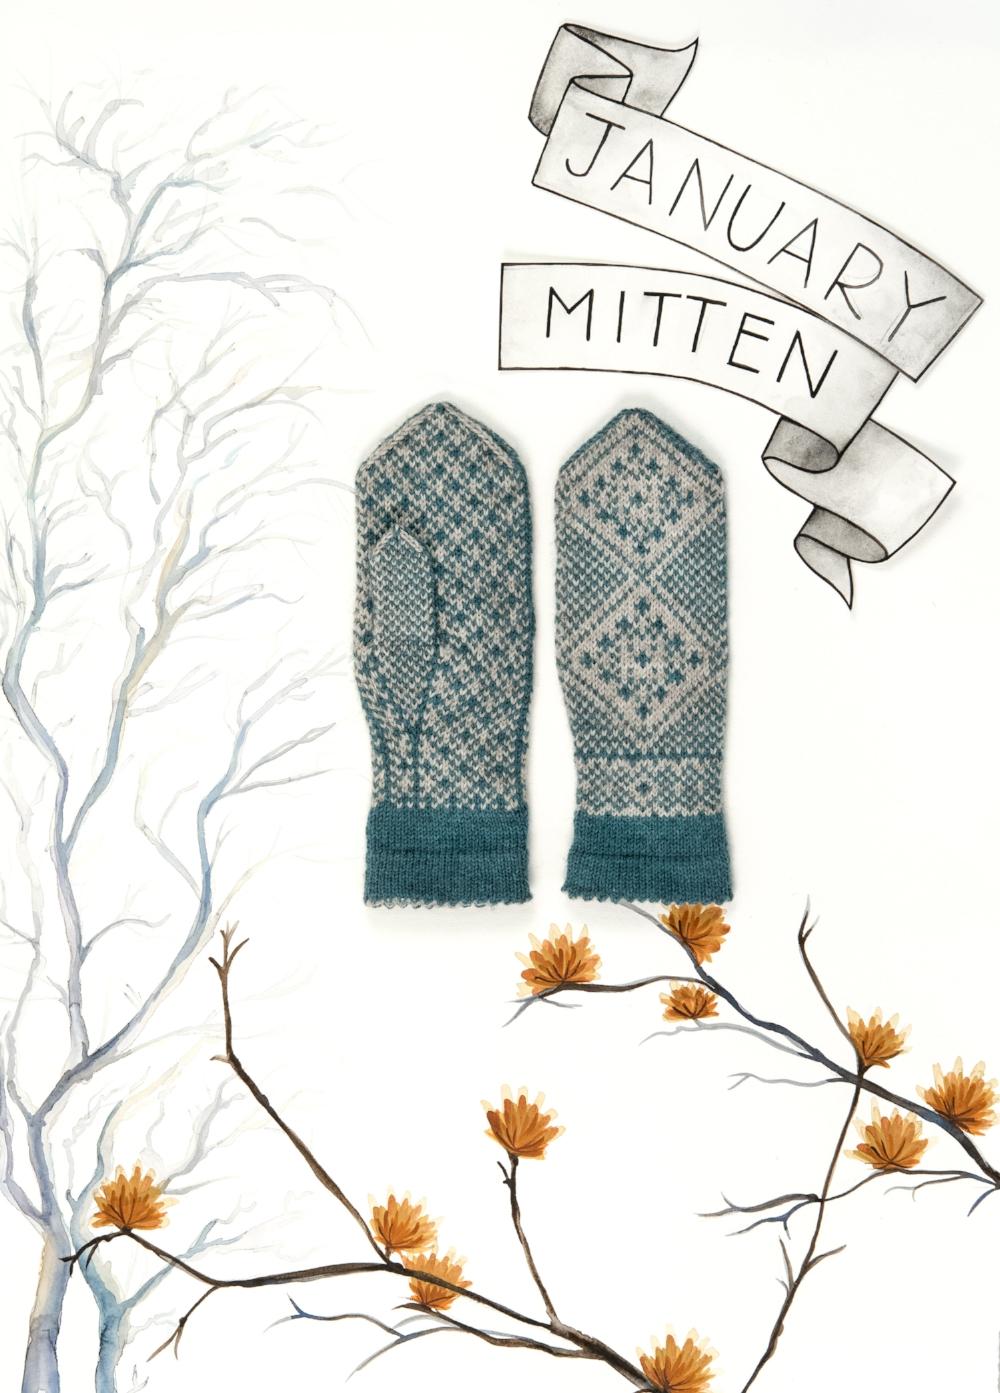 january_mittens-1.jpg